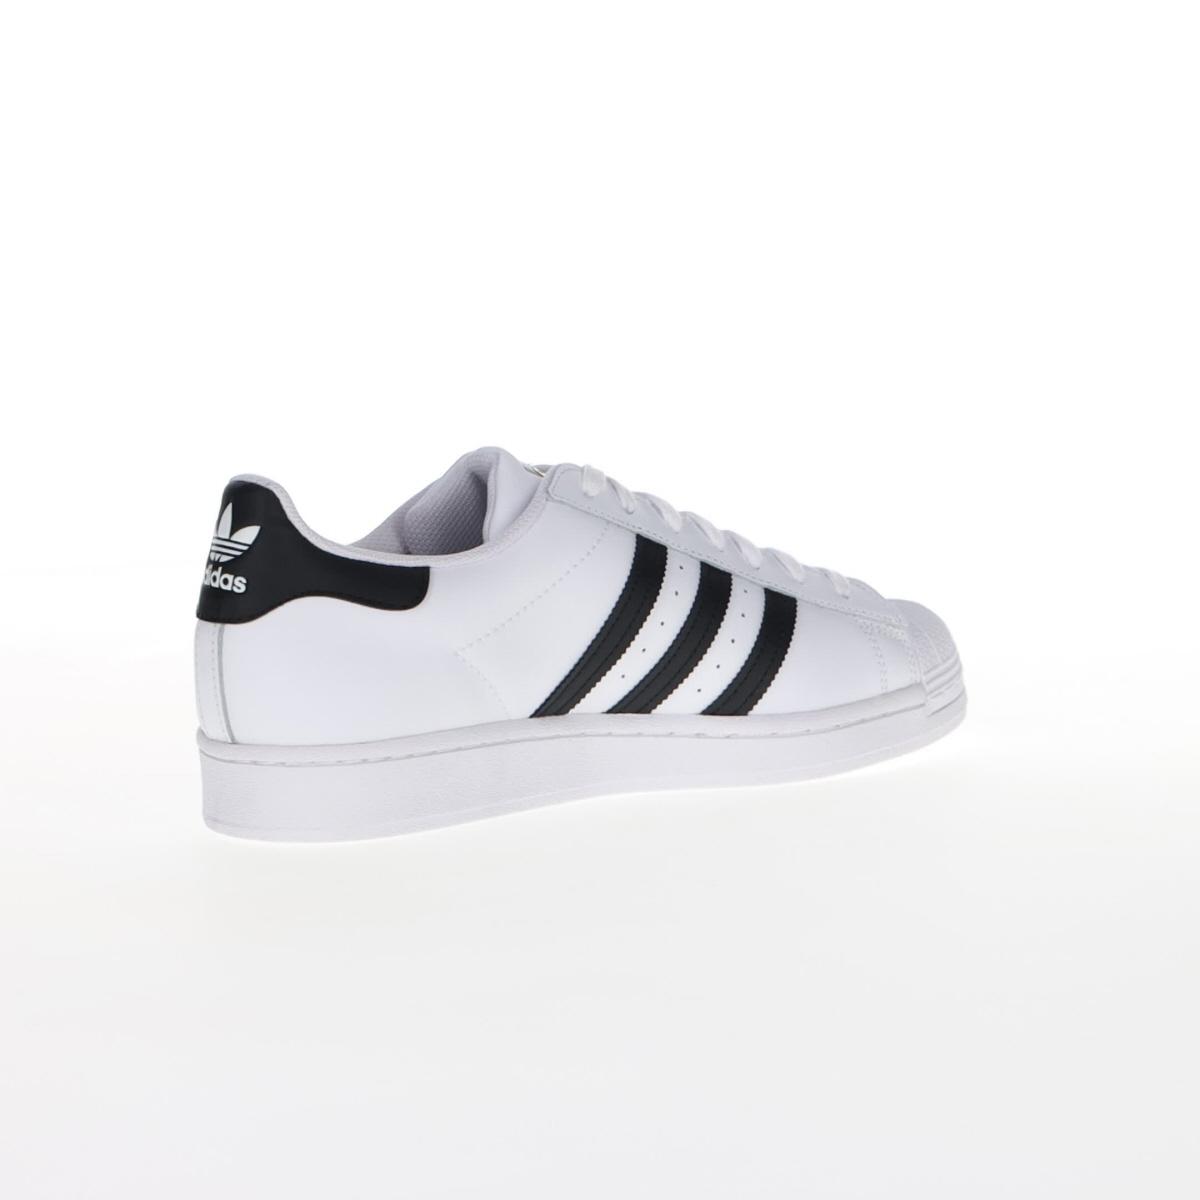 mochilas adidas feminina buscape women shoes sale